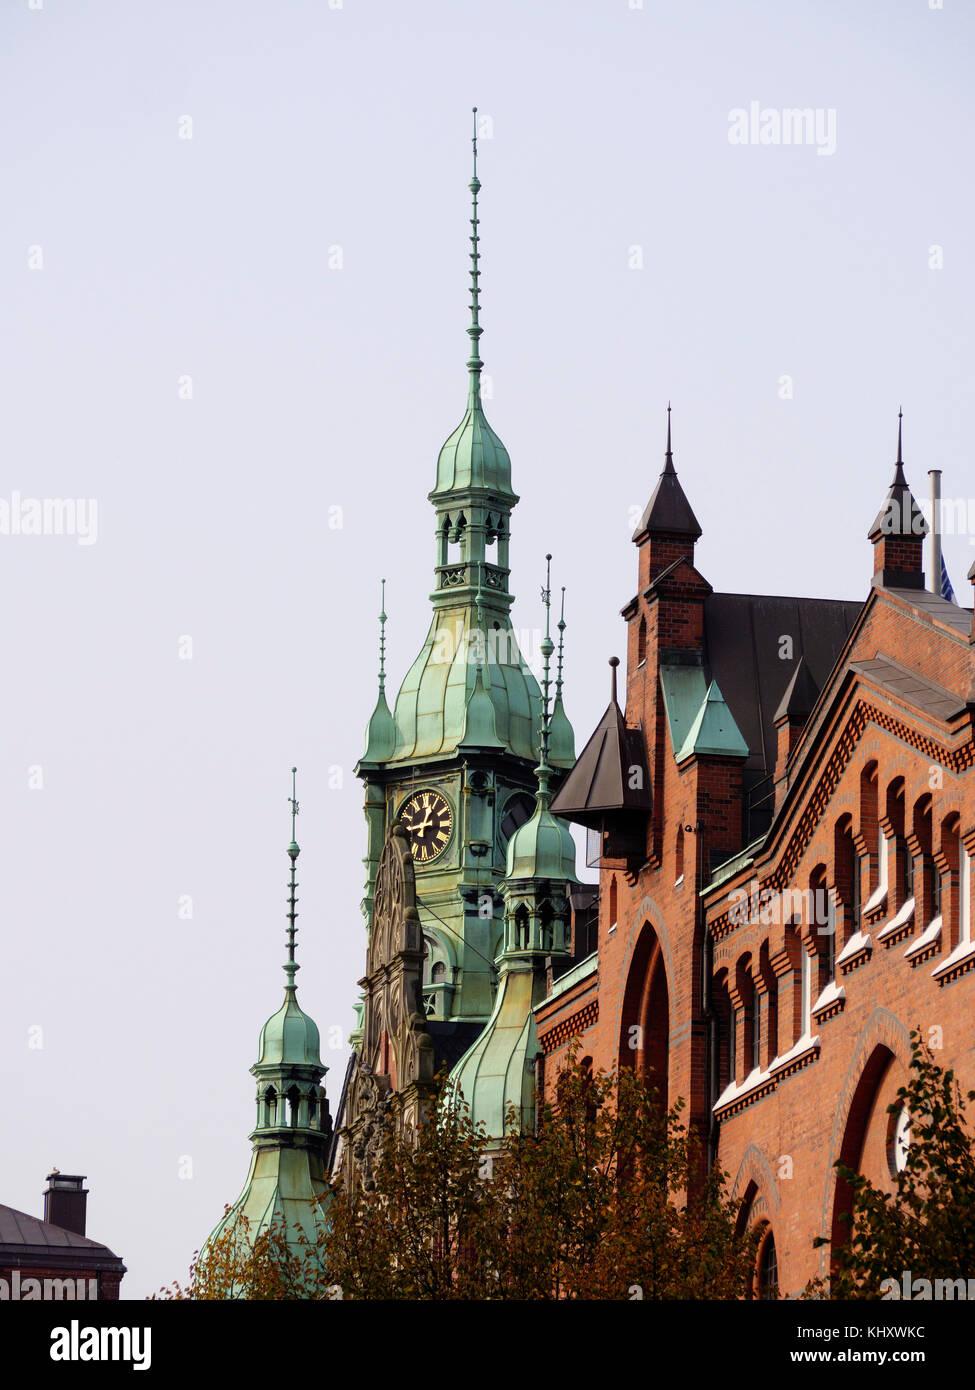 warehouses in Speicherstadt, Hamburg, Germany, Europe, UNESCO world heritage Stock Photo